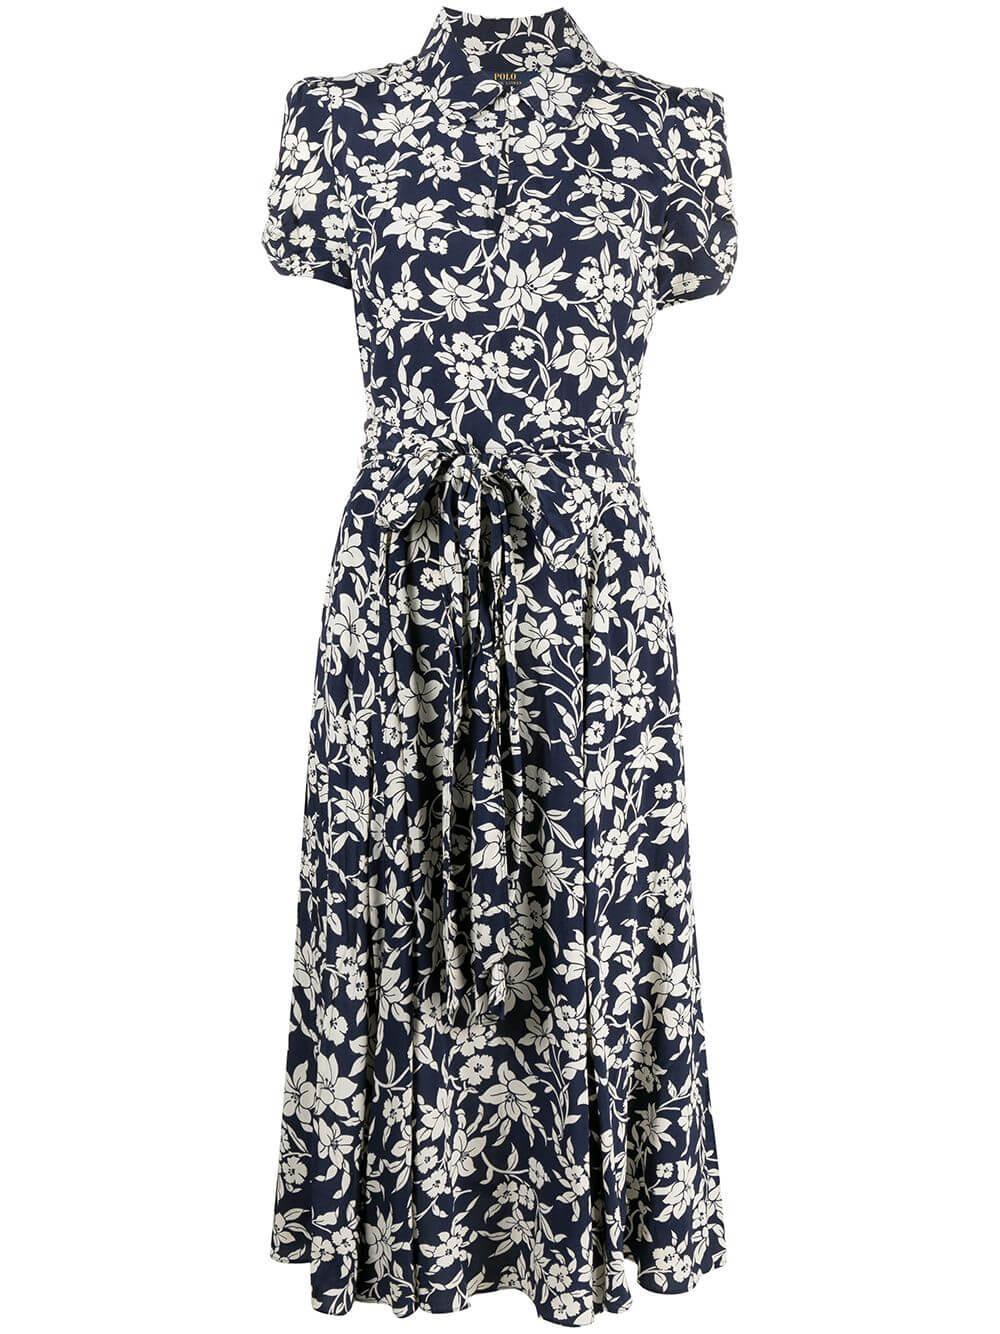 Nico Floral Dress